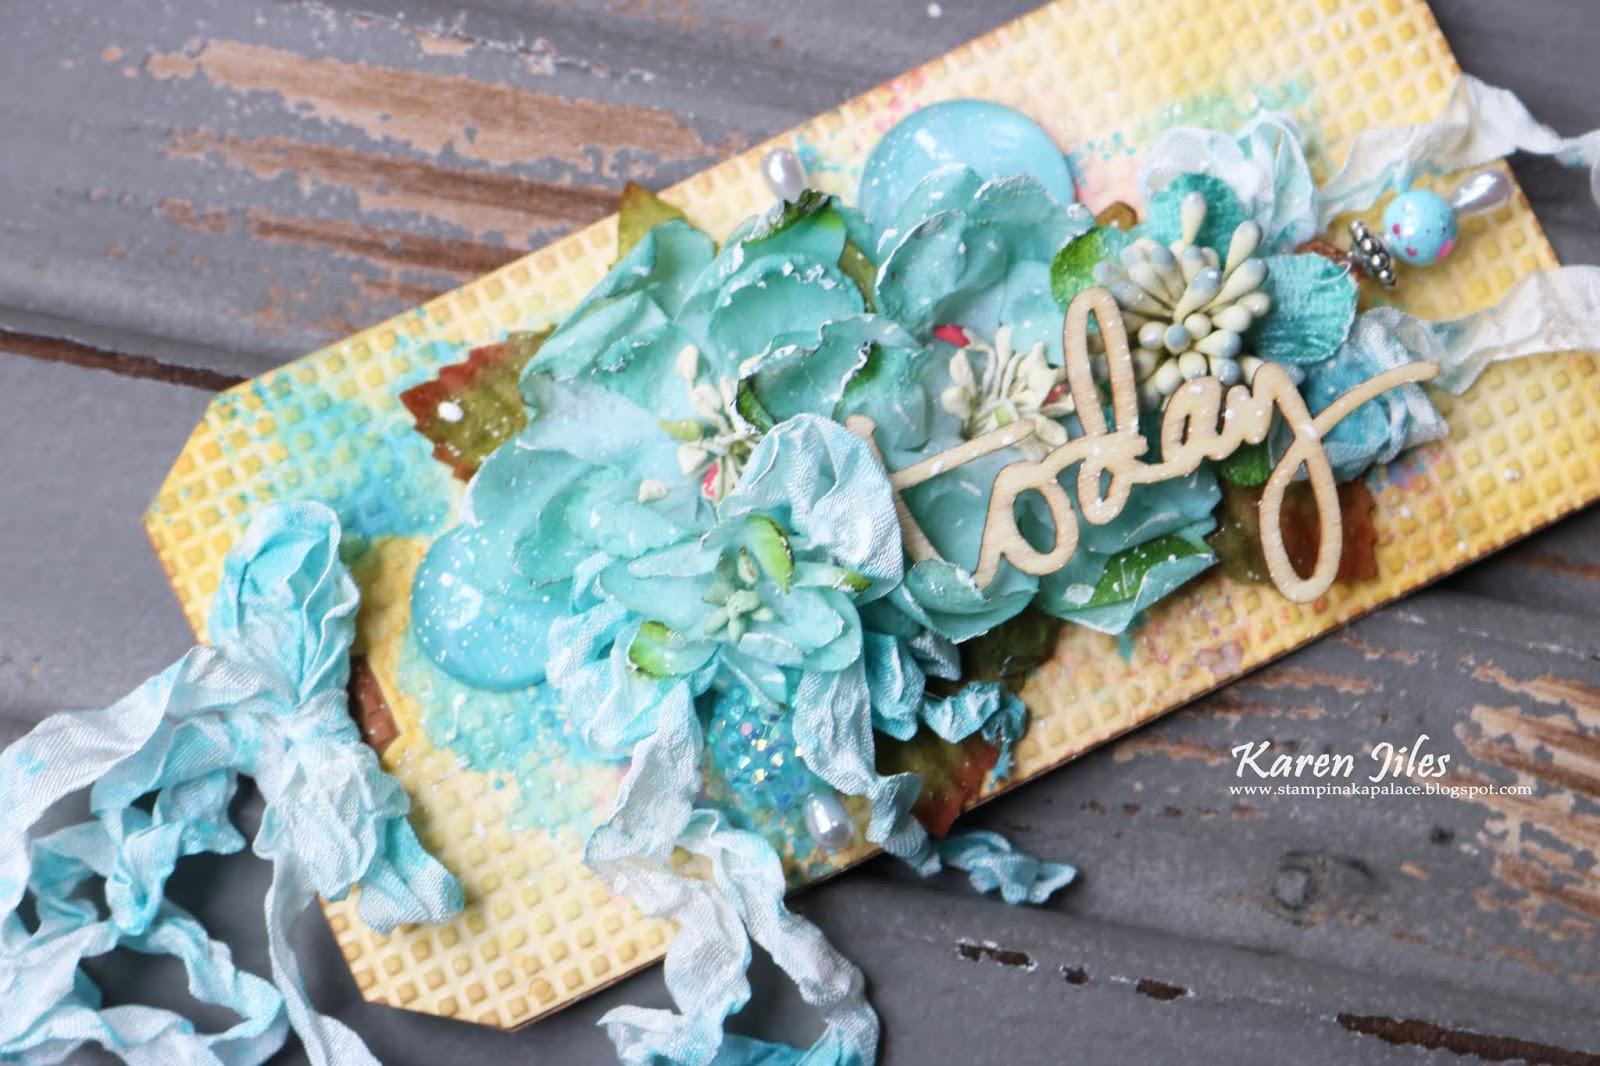 Craftwell Blog: Inspirational Tag by Karen Jiles